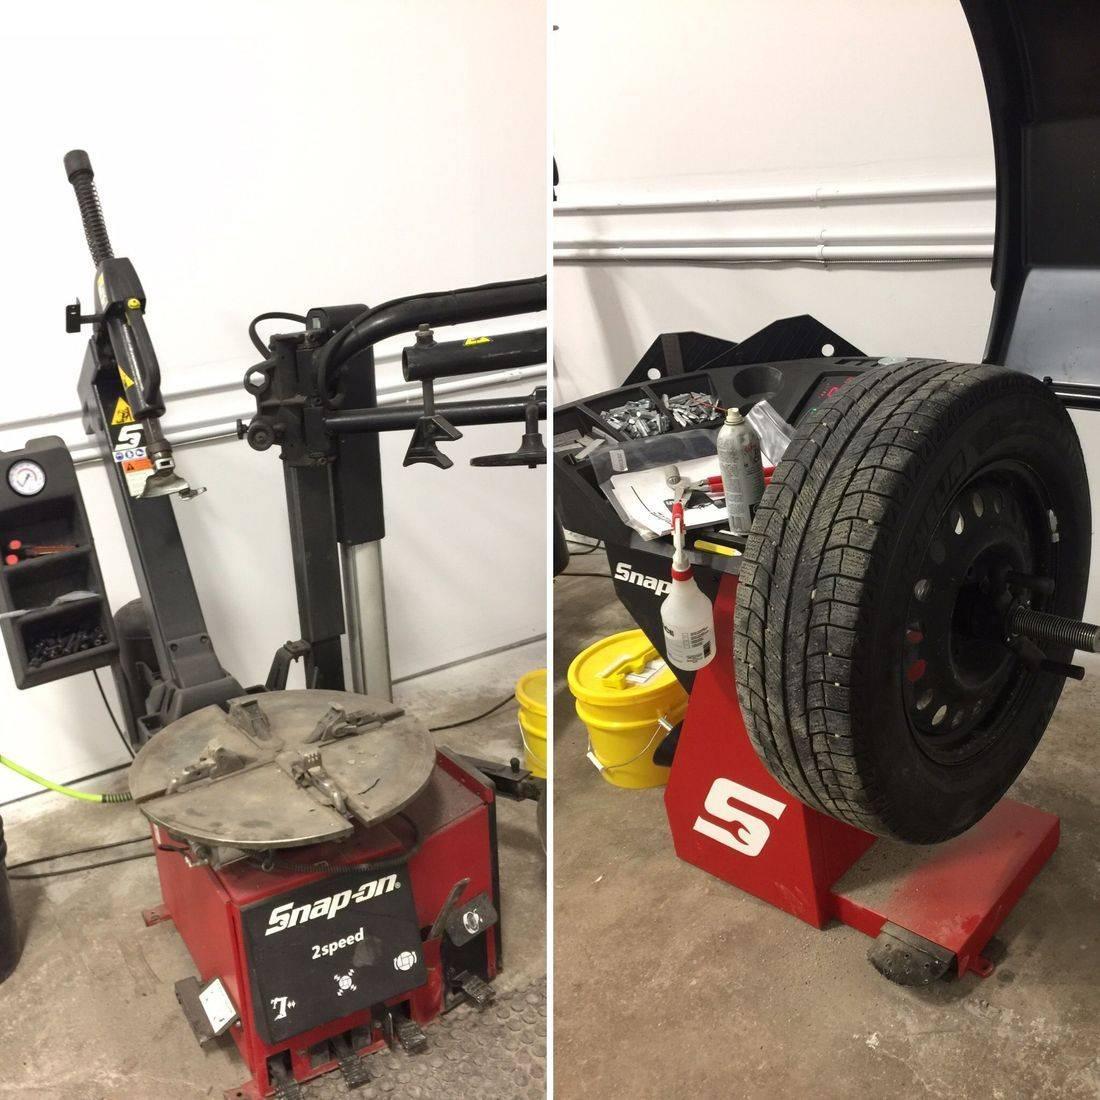 Tire Changer and Wheel Balancer